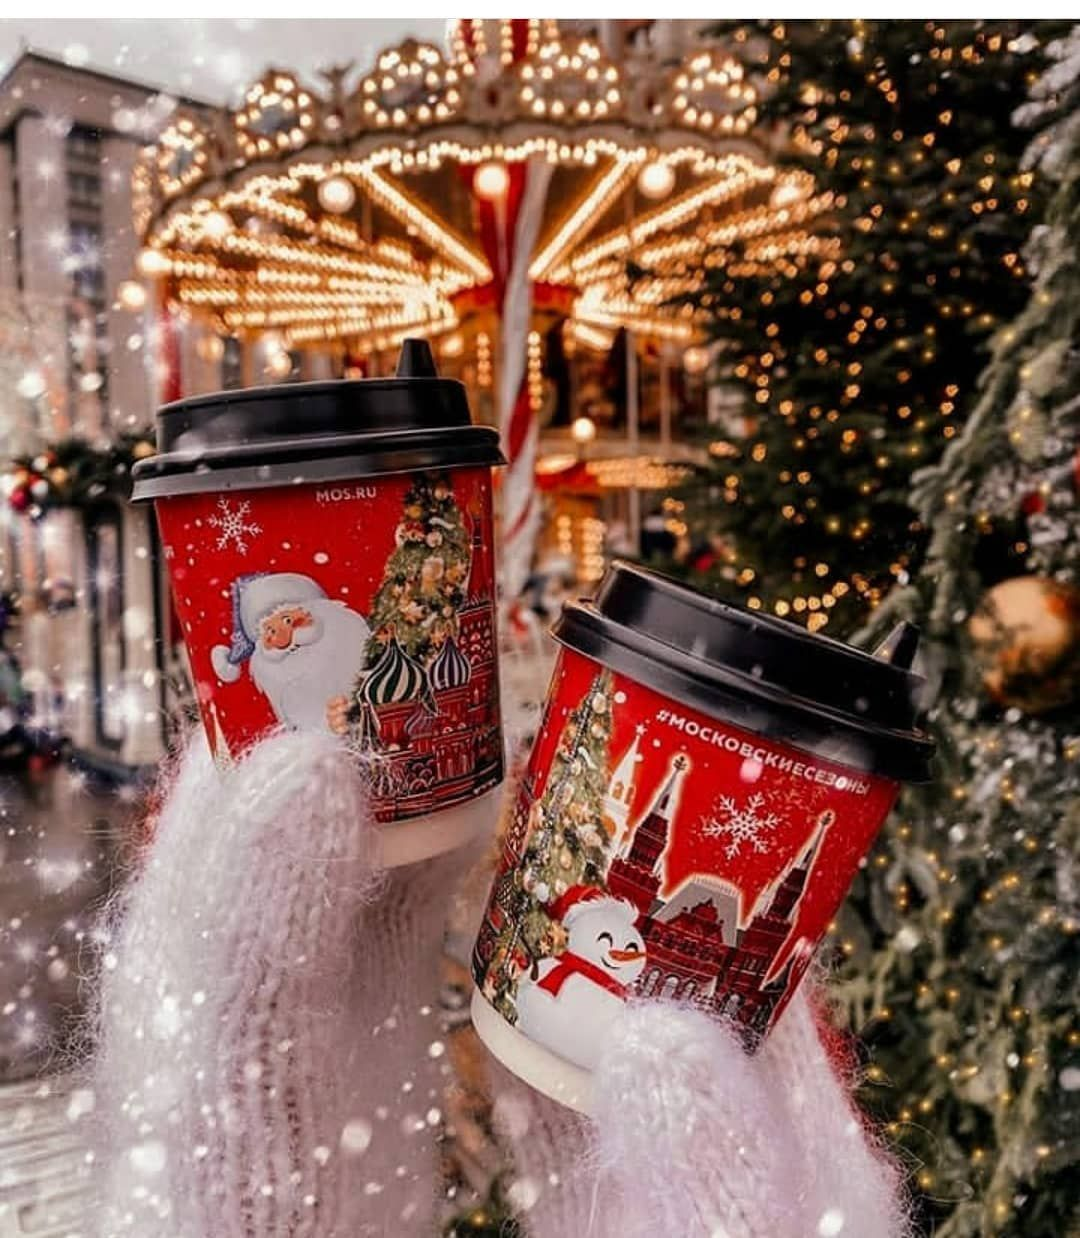 #christmastime#christmasofnight#christmaseve#christmasvibes#christmastree#christmascountdown#christmas#christmaseve#christmasshopping#christmasshopping#christmastraditions#christmasmood#christmasday#christmasdecorating#christmasfairy#christmasquotes#christmashome#lights#white#rudolf#santaclause#snow#wreath#toys#gifts#🎉🎊🎄🌨️